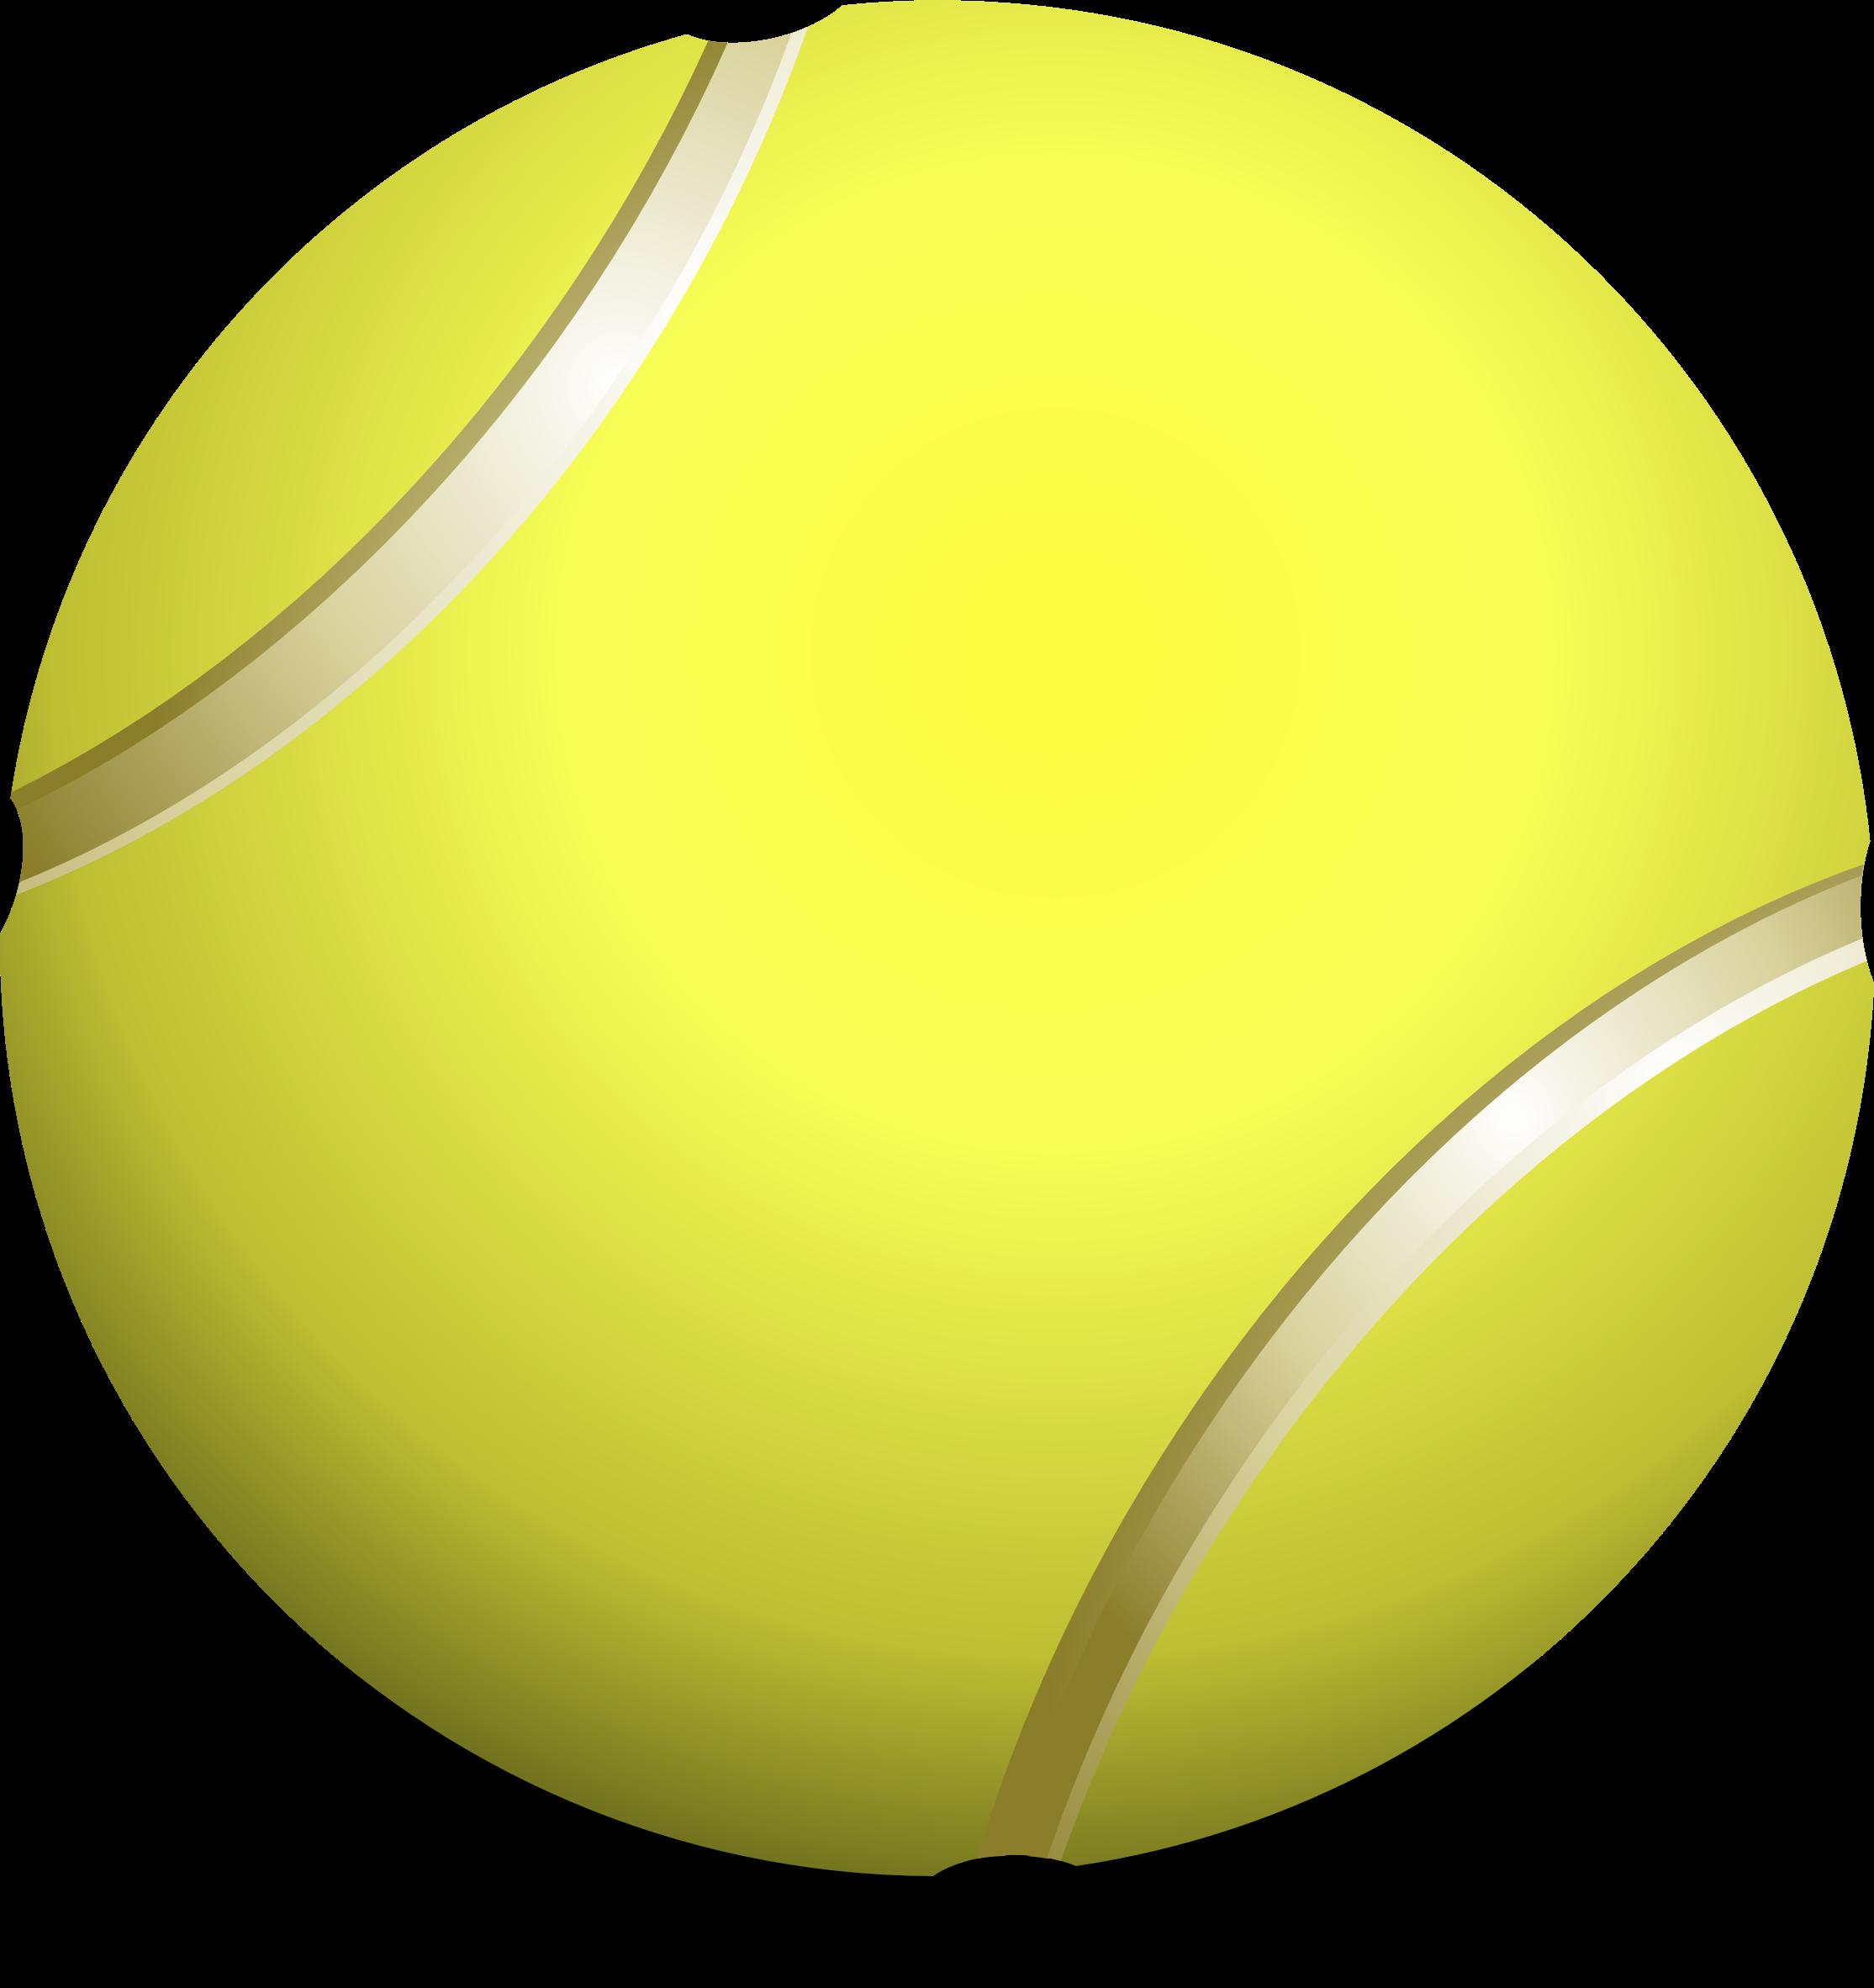 Tennis Ball clipart Teniso kamuoliukas ball Clipart Free